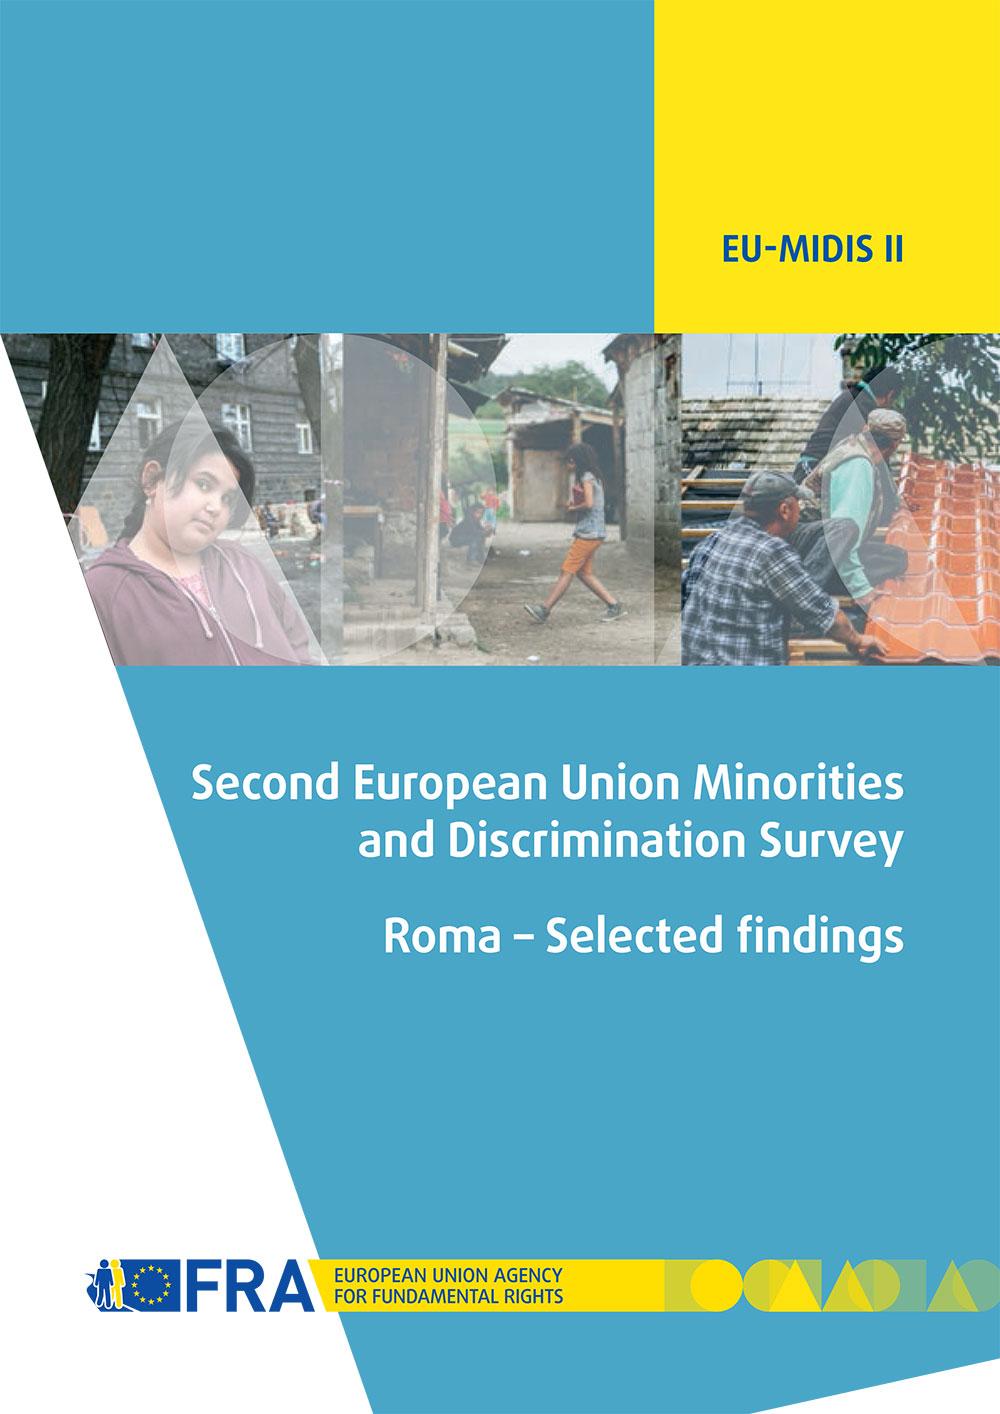 Report cover EU-MIDIS II Roma selected findings